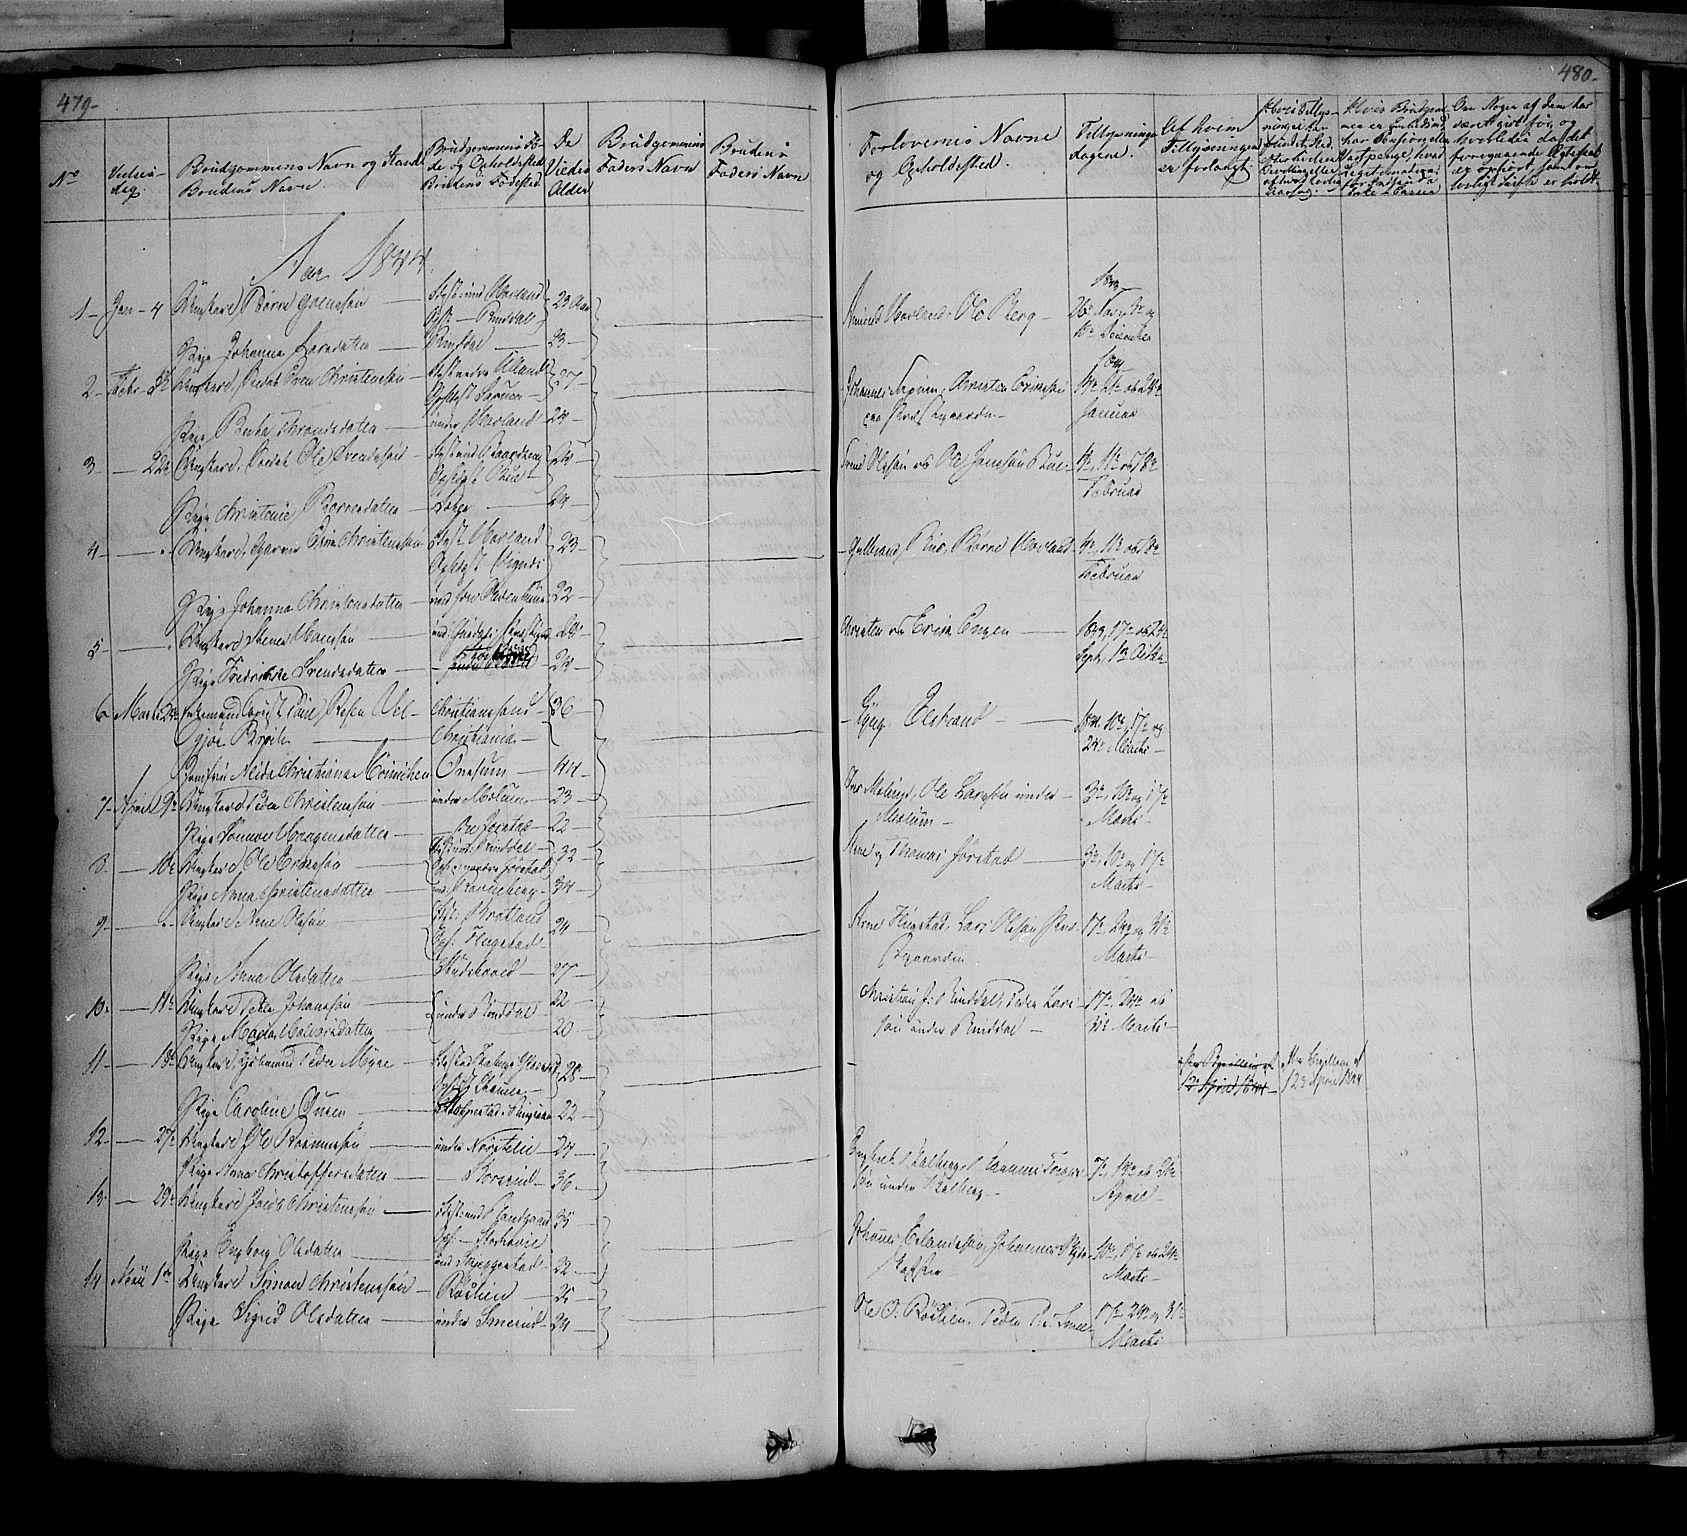 SAH, Fåberg prestekontor, Ministerialbok nr. 5, 1836-1854, s. 479-480